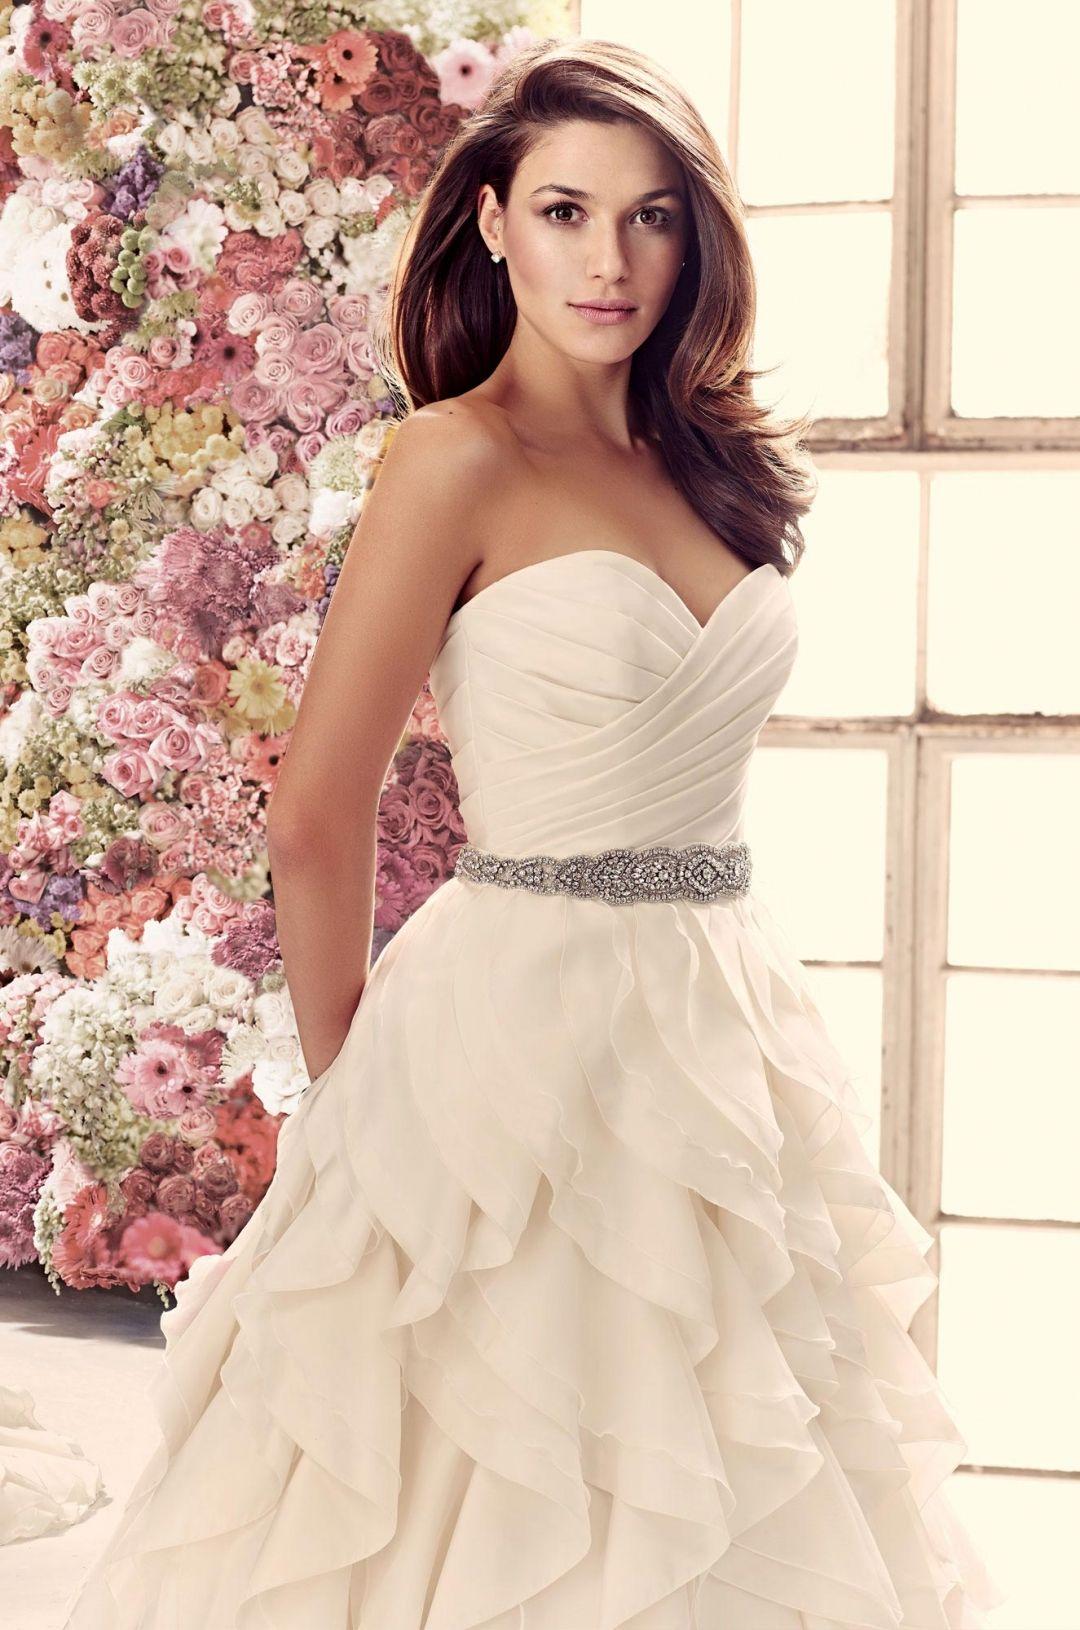 Ruffled Taffeta Wedding Dress Style 1908 Mikaella